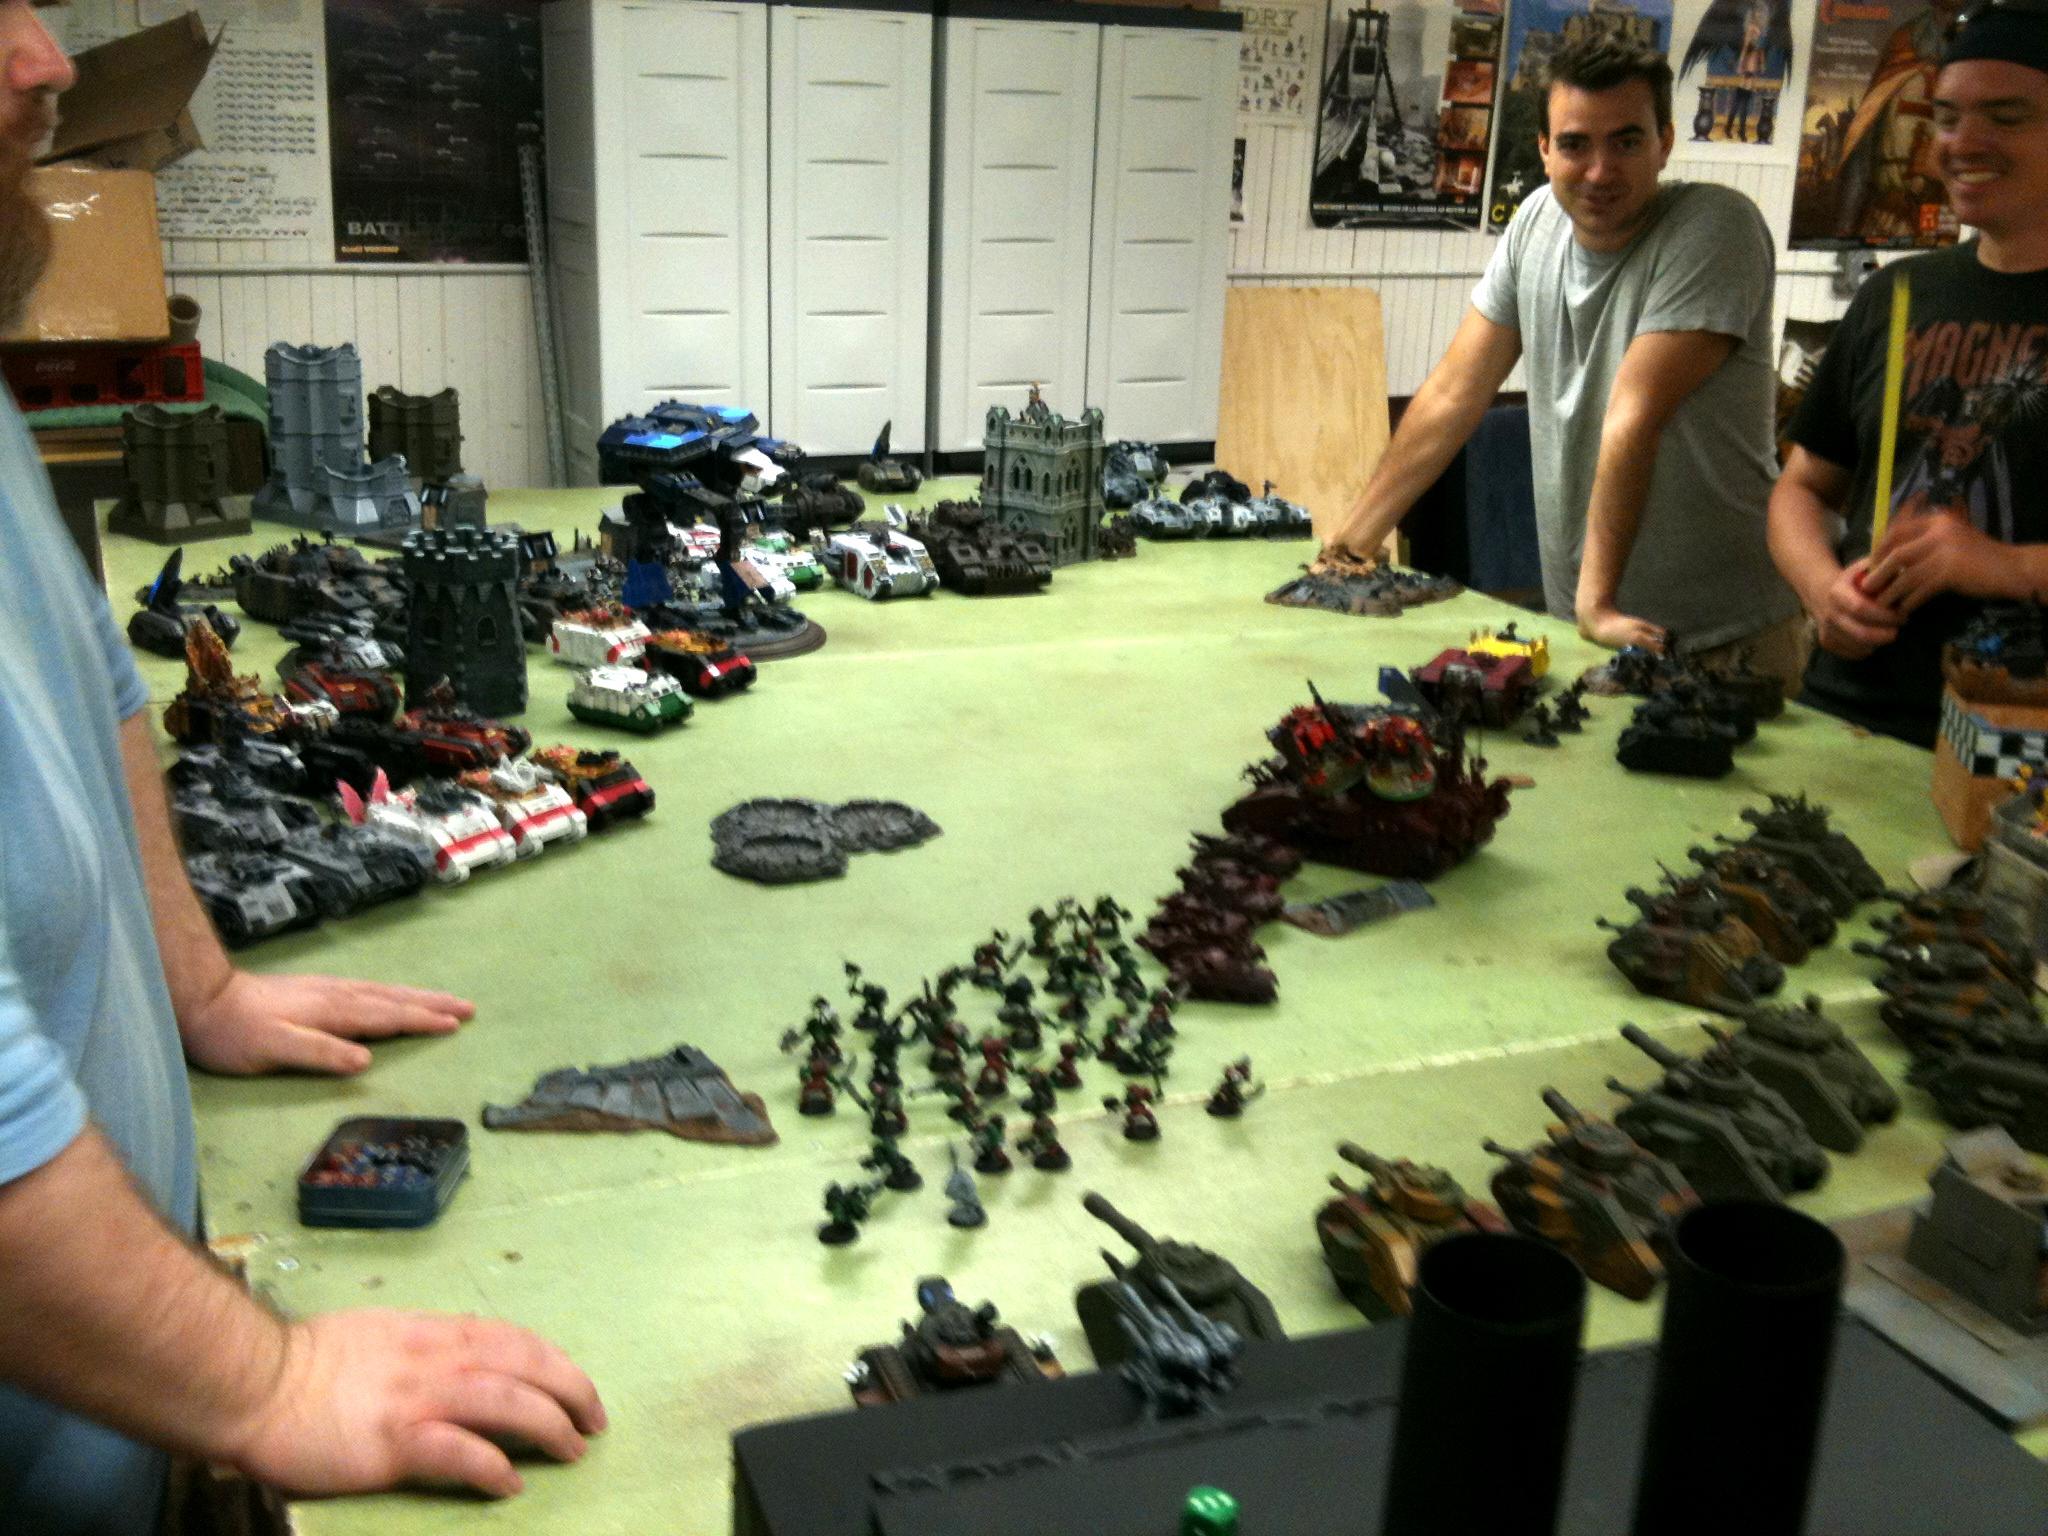 Apocalypse, Mega-battle, Warhammer 40,000